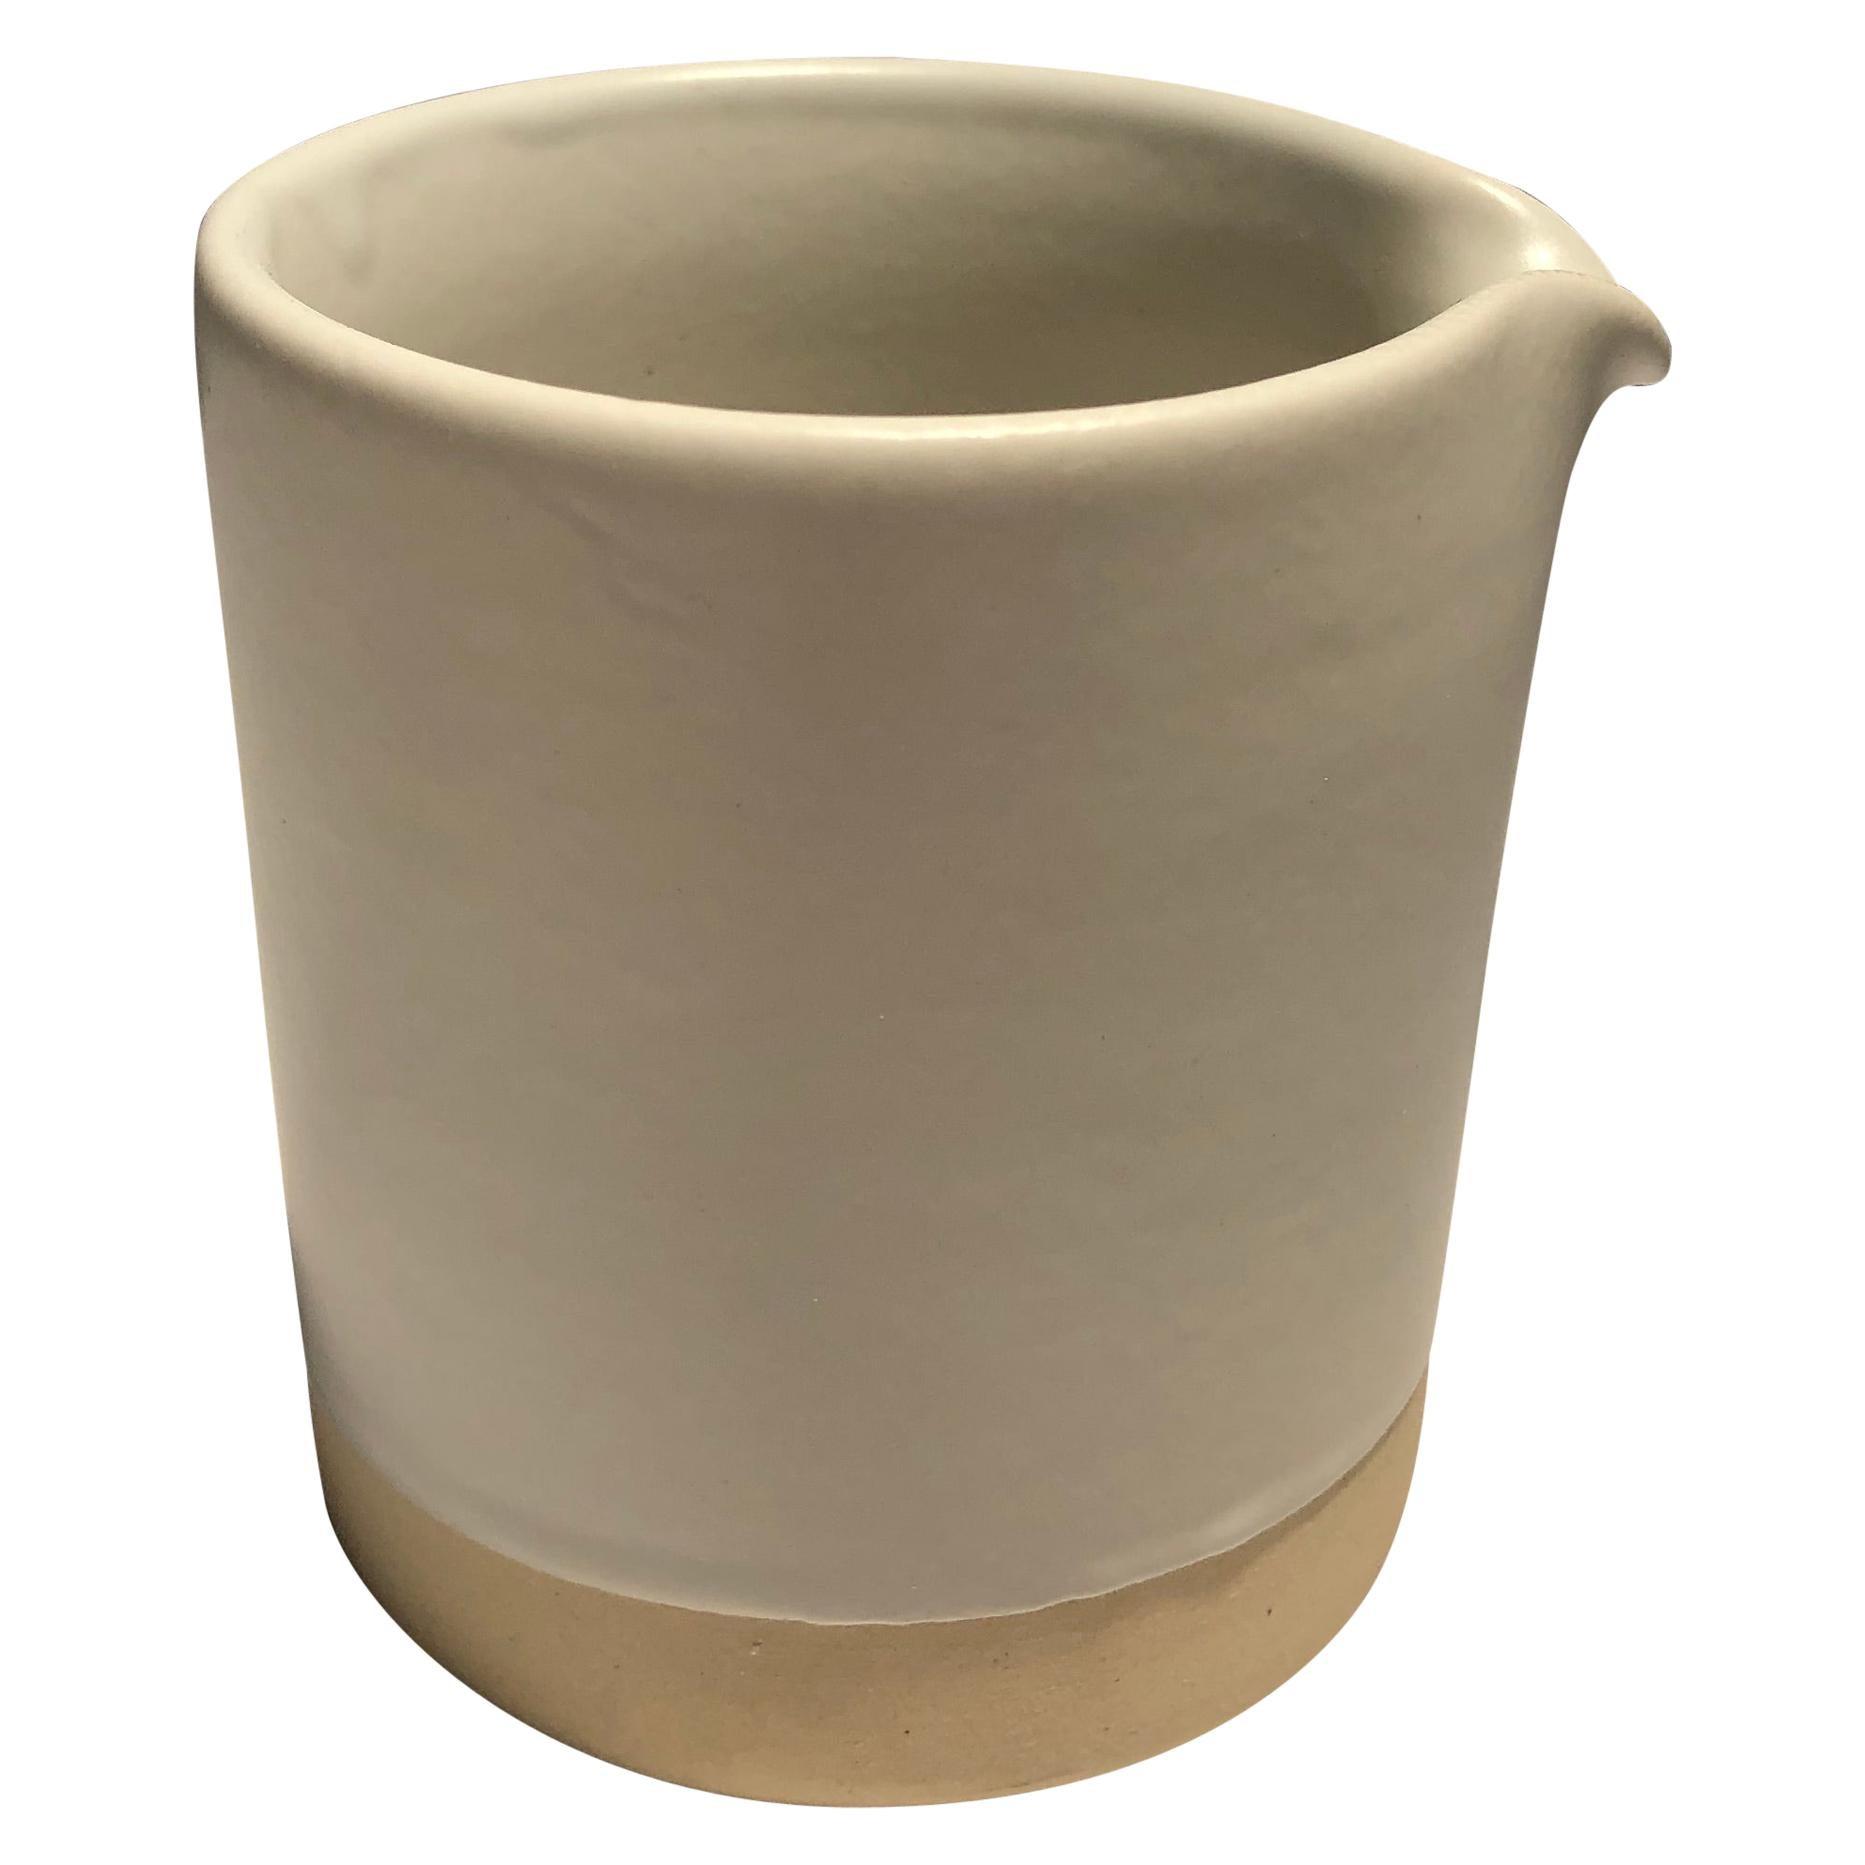 Handmade Ceramic Matte Creamer in White, in Stock